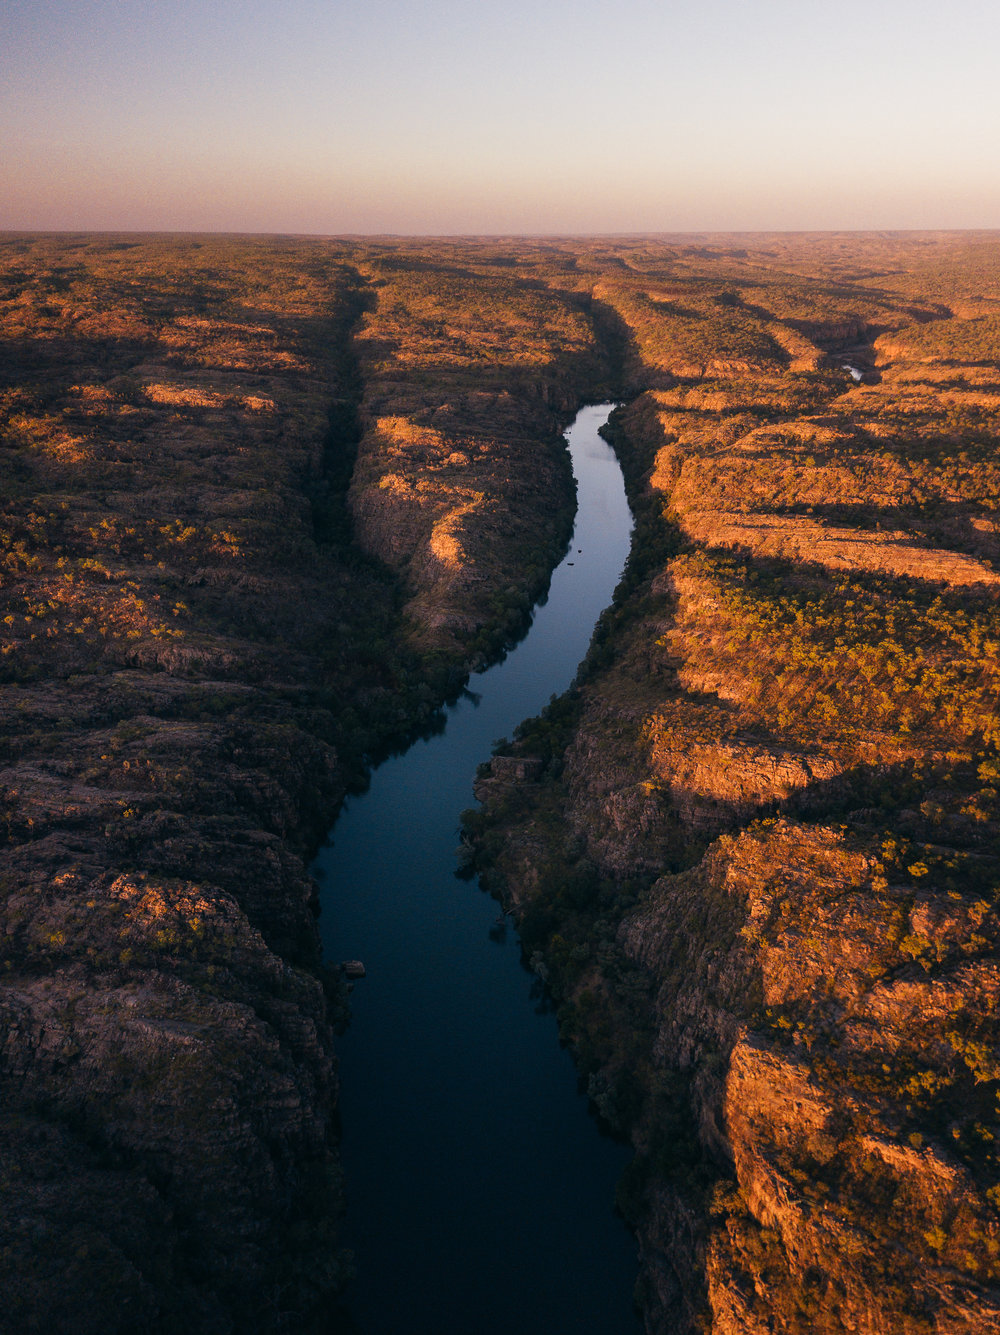 Melissa-Findley-Northern-Territory-Blog-06.jpg